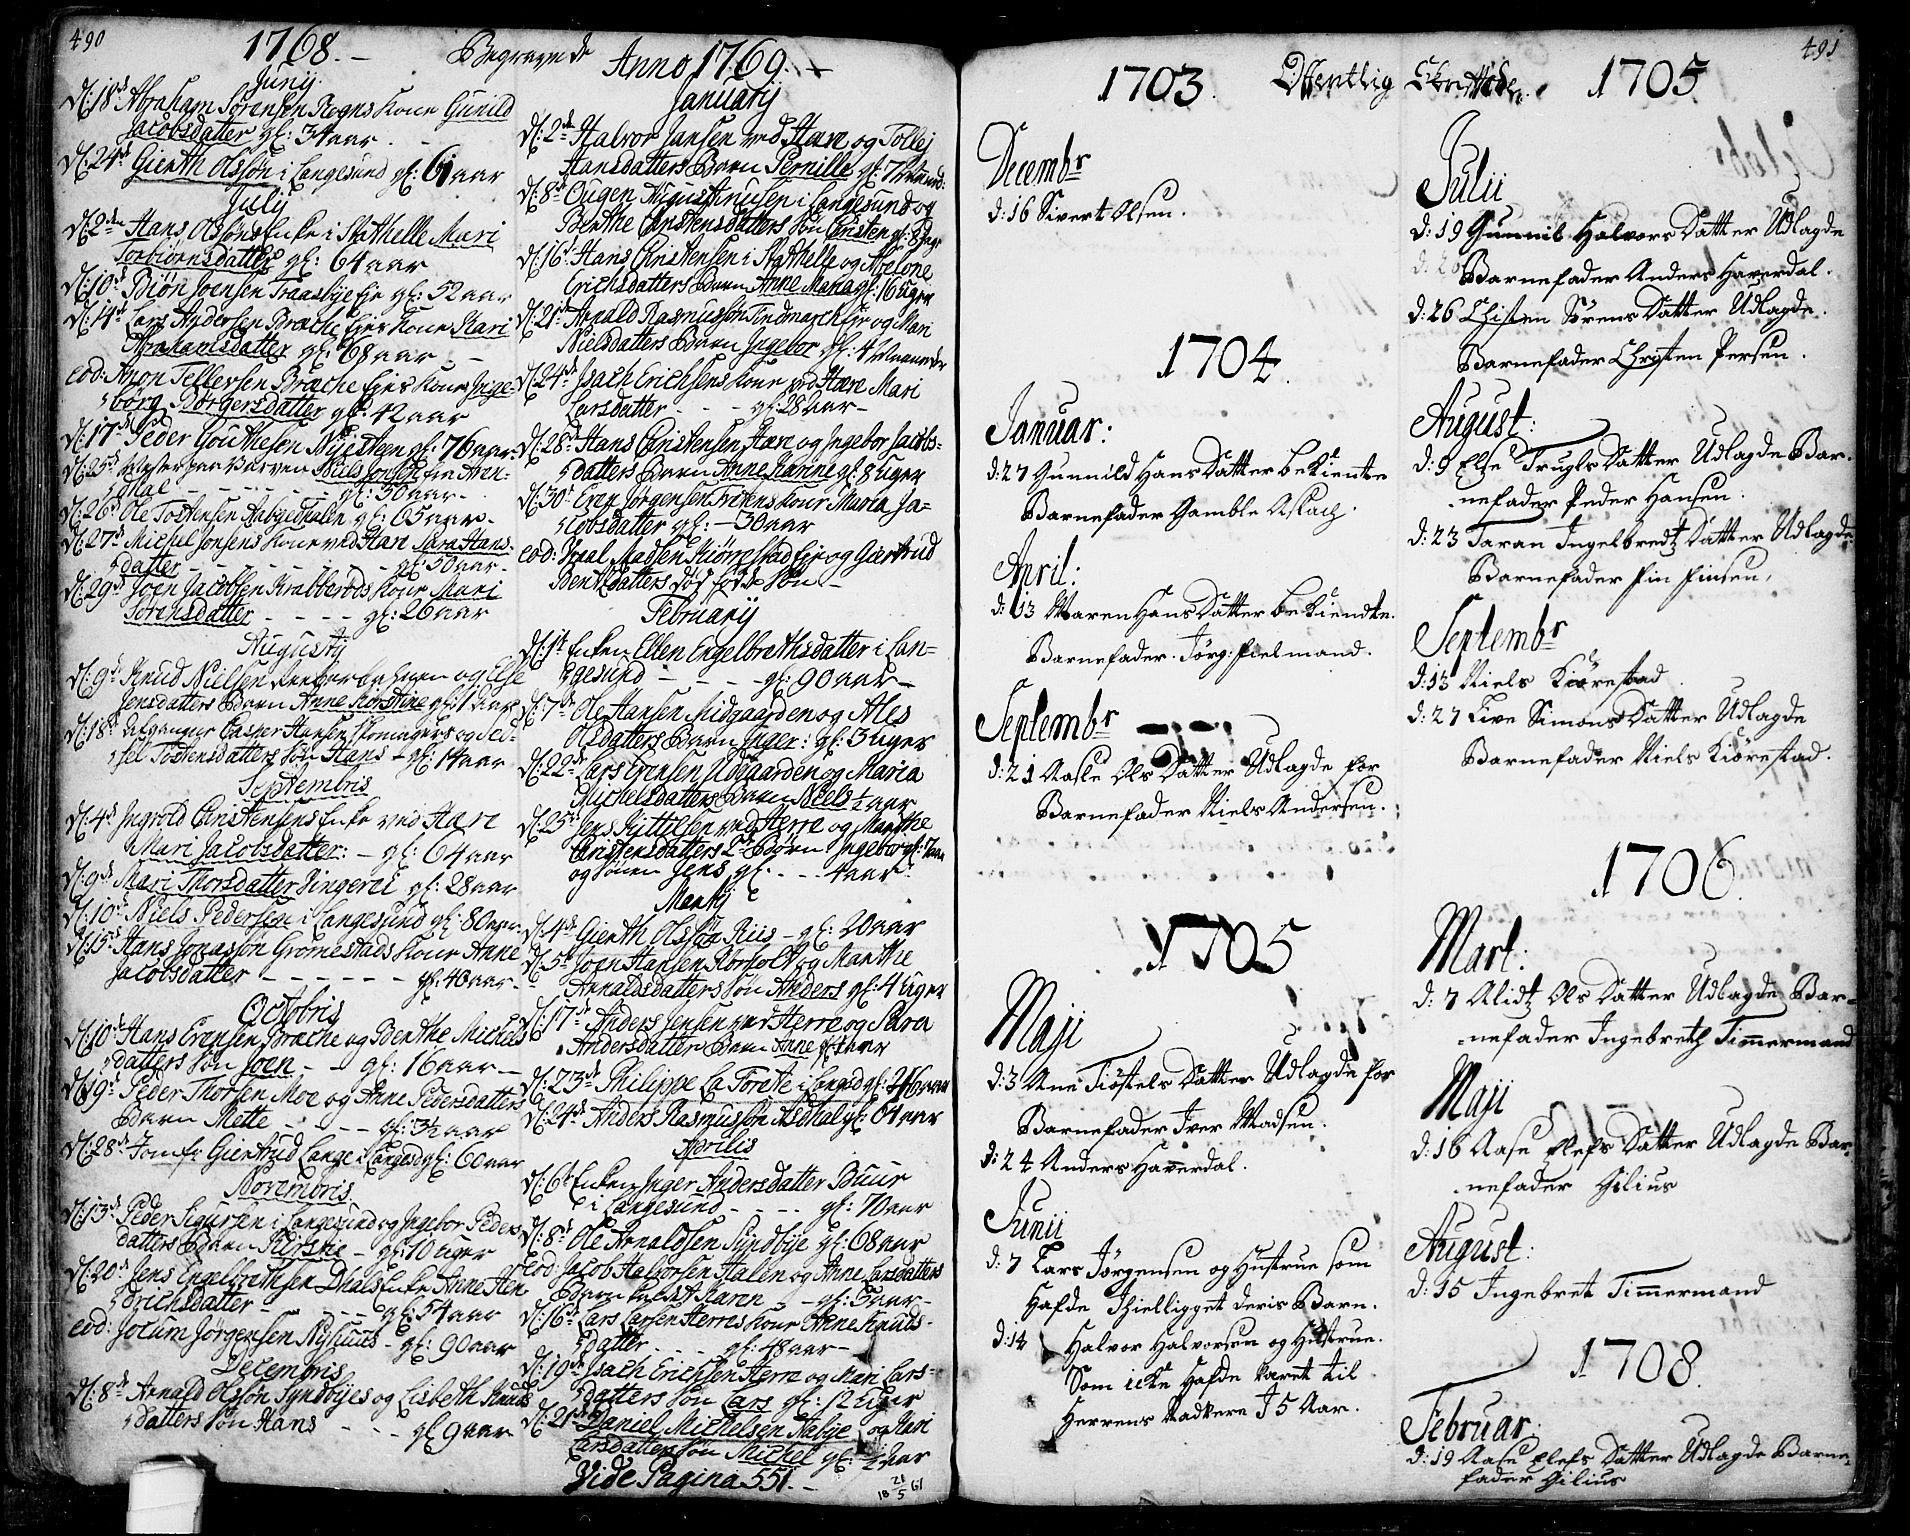 SAKO, Bamble kirkebøker, F/Fa/L0001: Ministerialbok nr. I 1, 1702-1774, s. 490-491